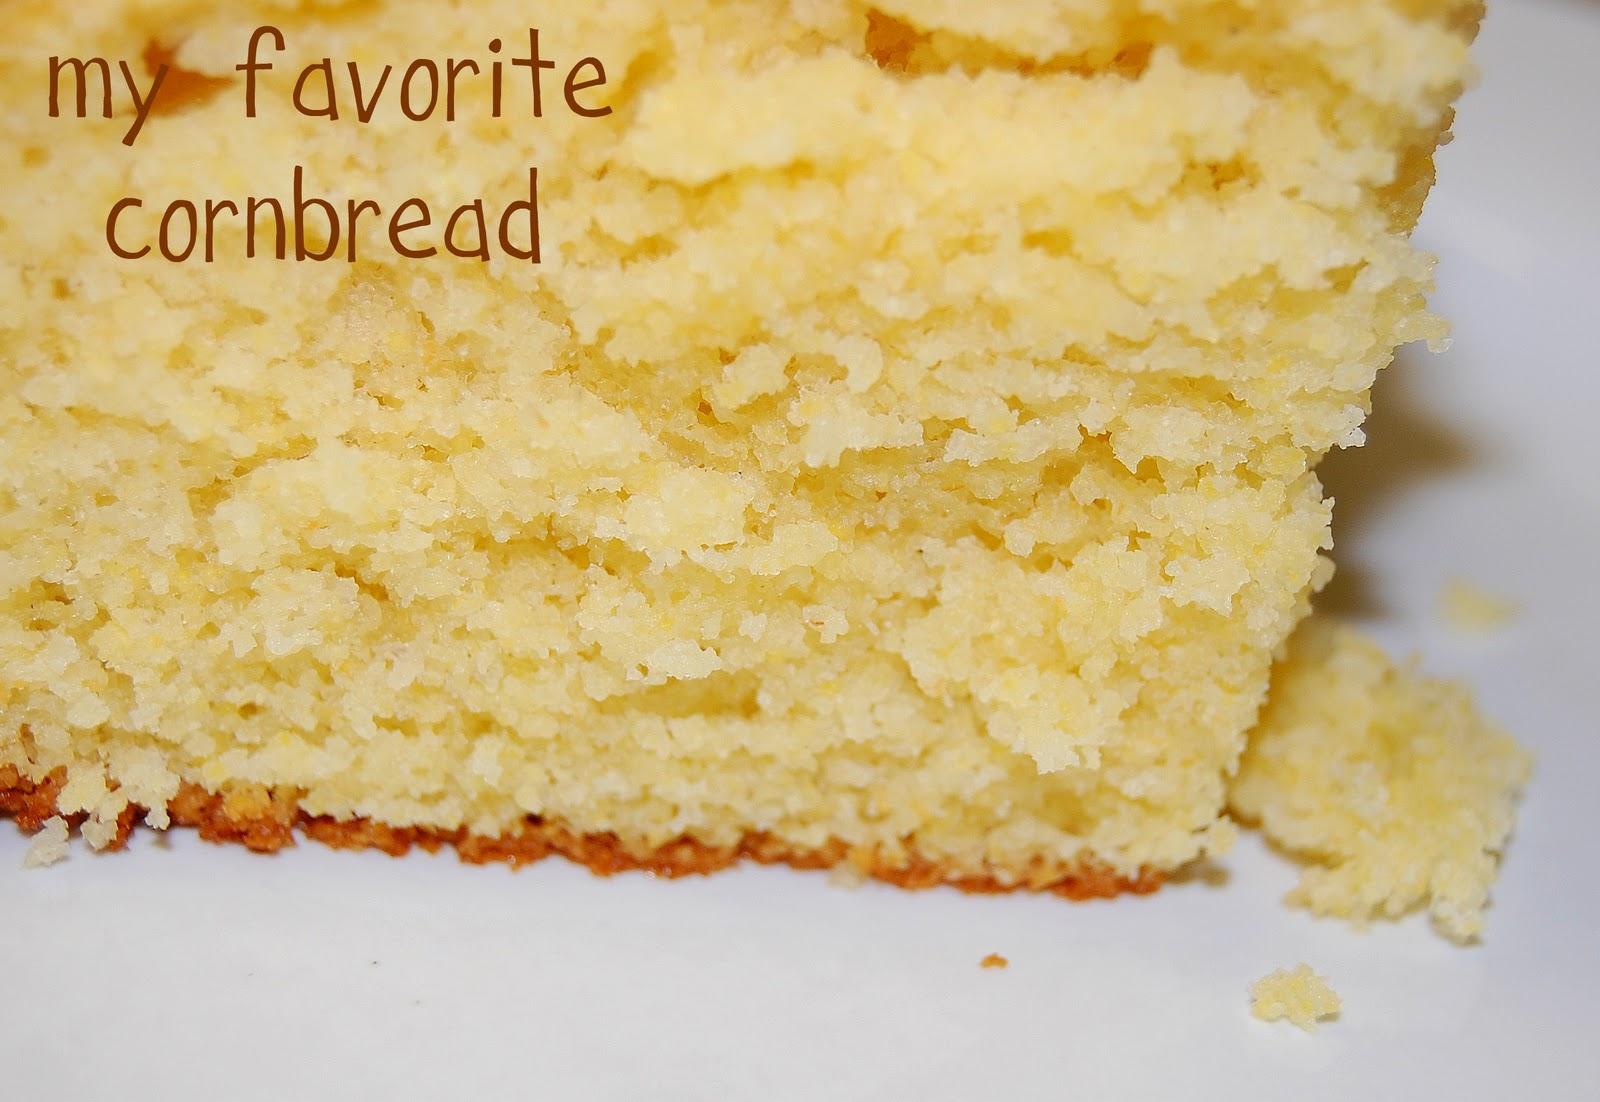 Corn Bread Recipes with Corn http://www.whateverdeedeewants.com/2010 ...